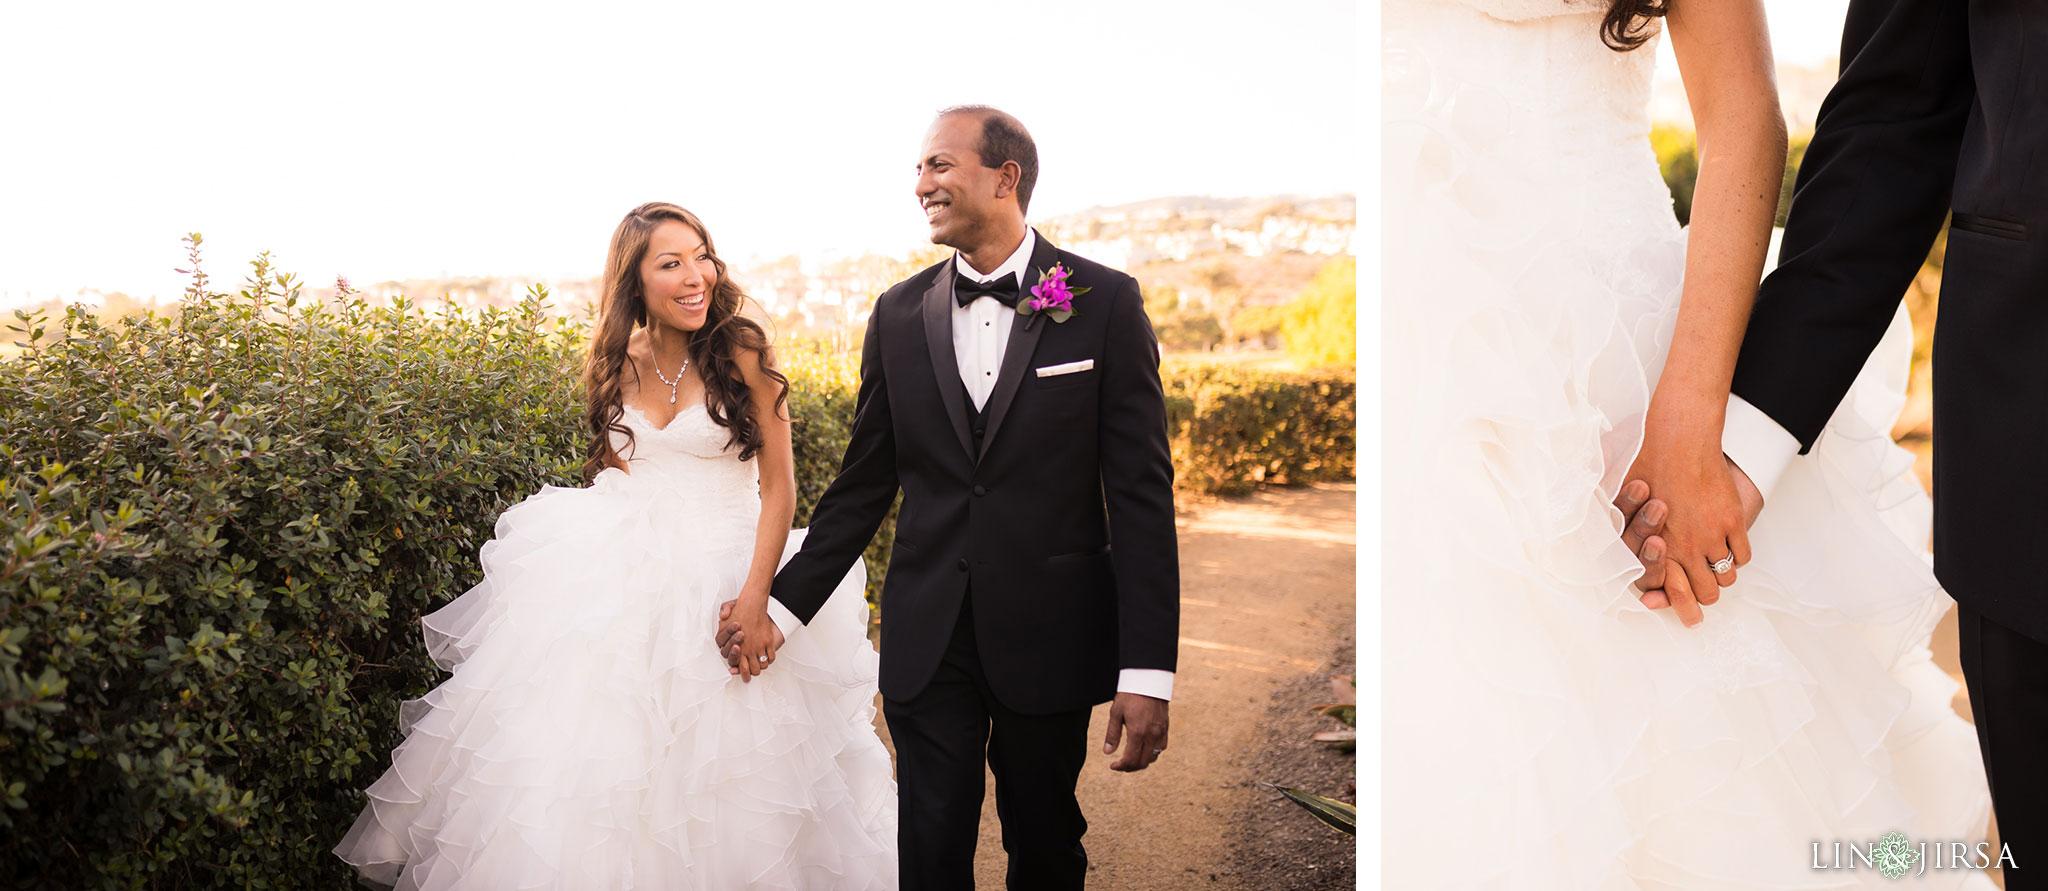 24 monarch beach resort wedding photography